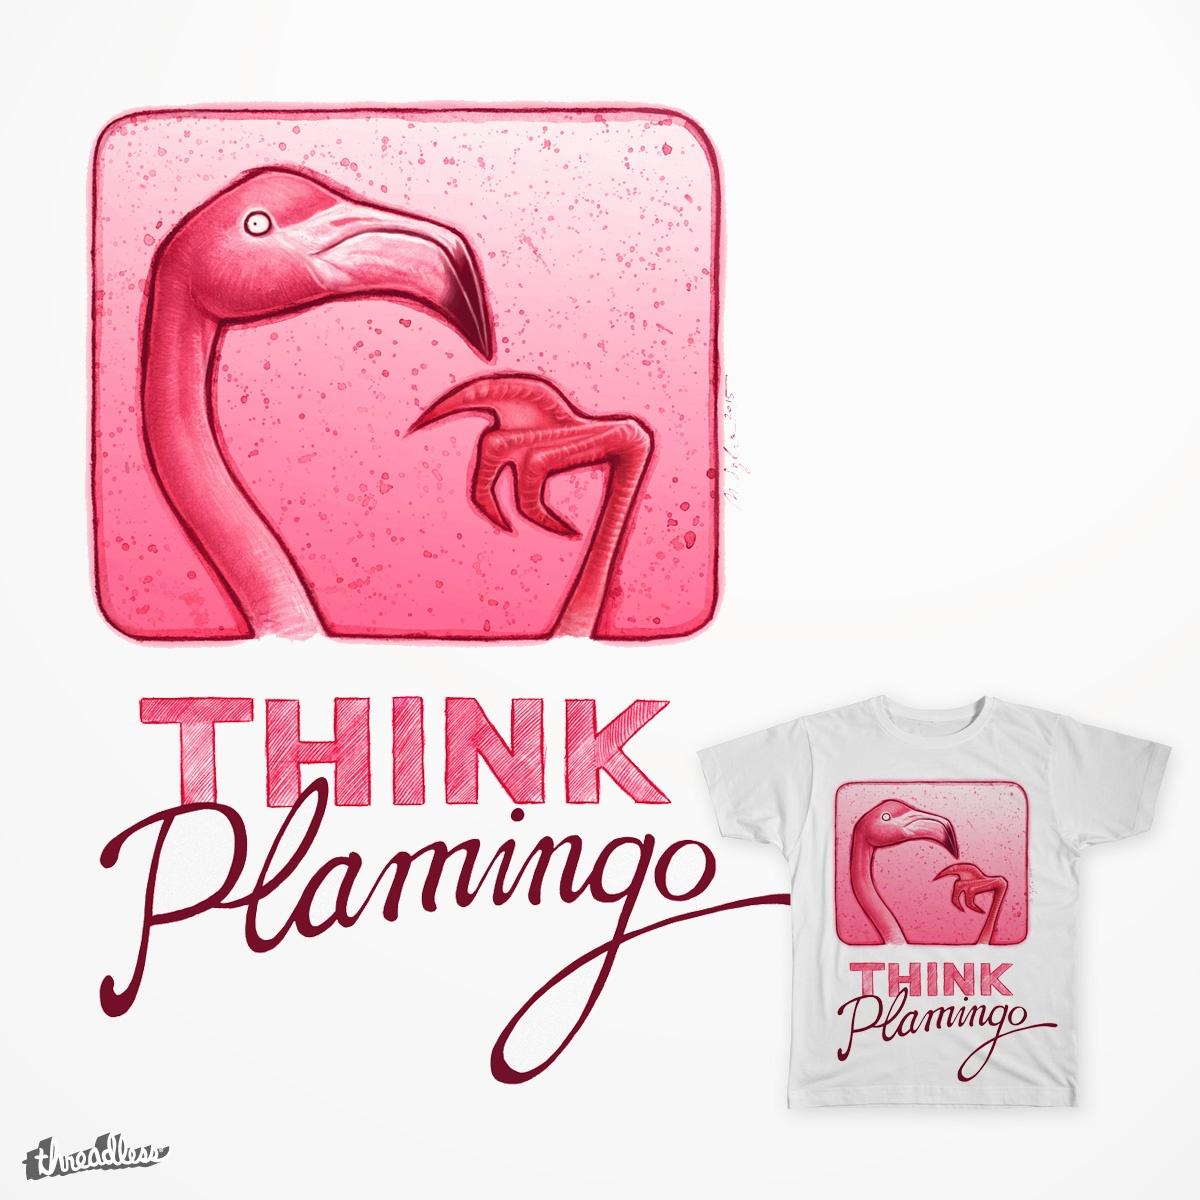 Think Plamingo by michal.szyksznian on Threadless